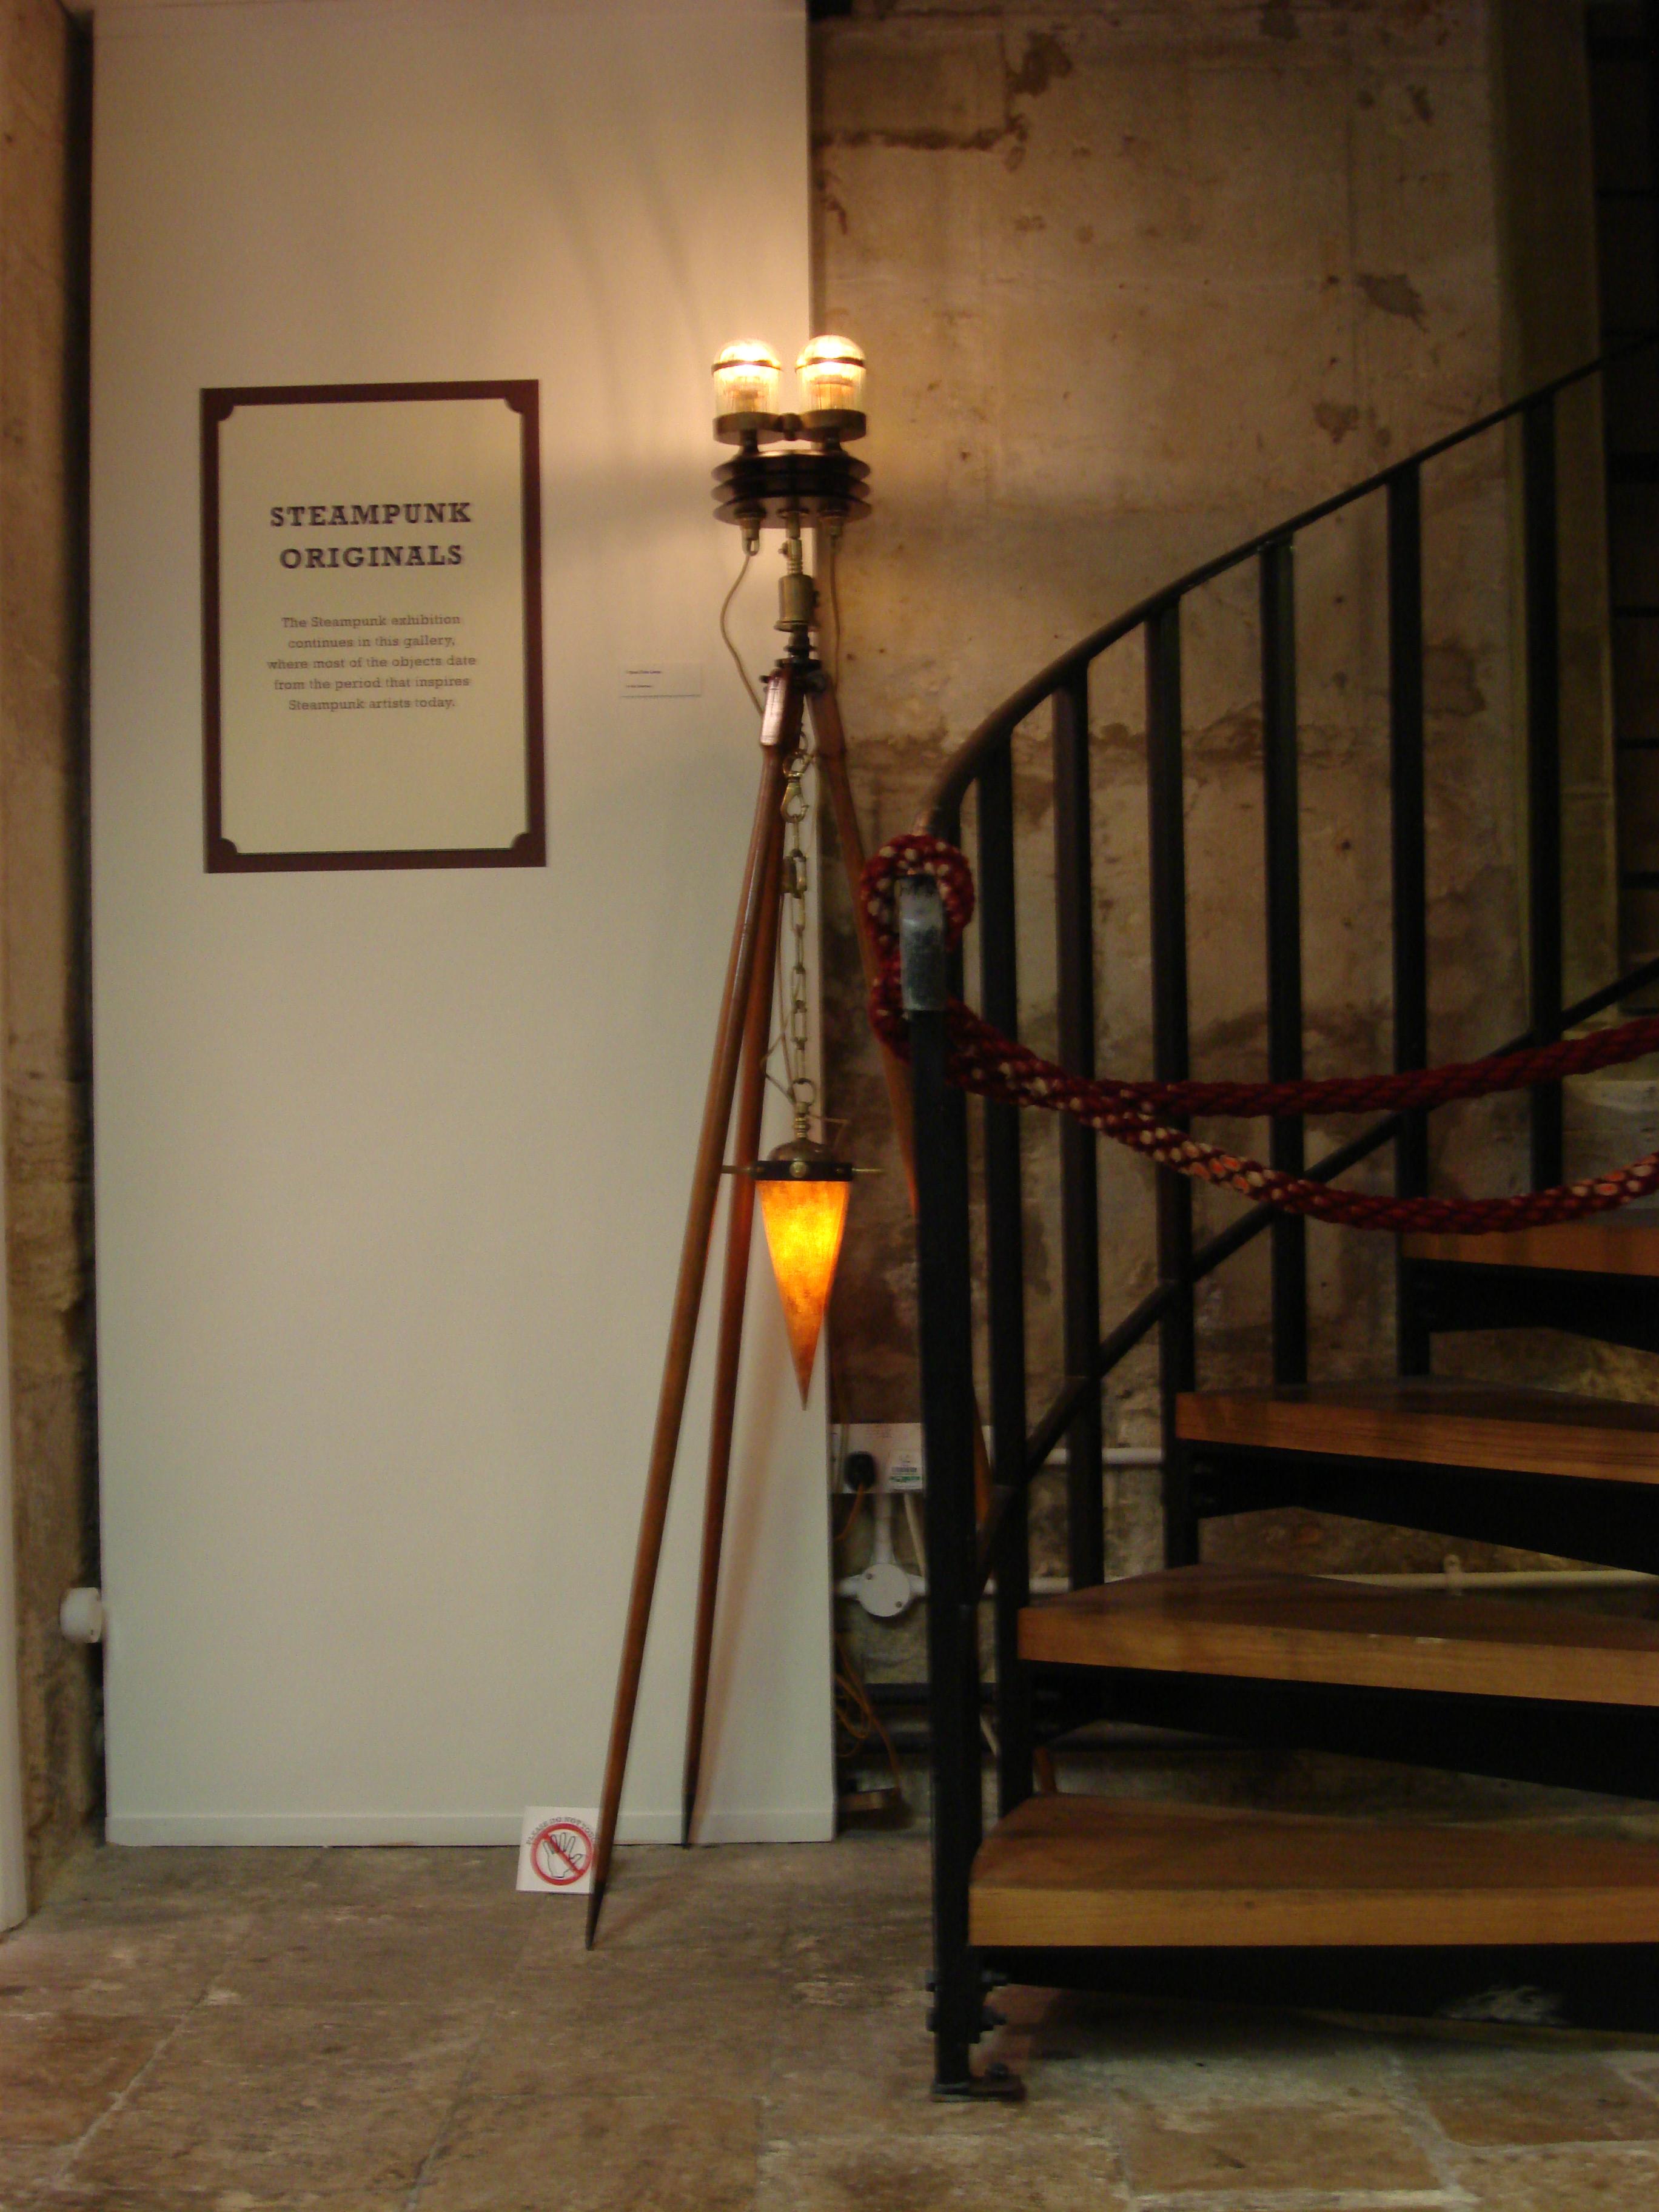 Steampunk Tripod Floor Lamp + Sam Van Olffen\'s Magnificent ...